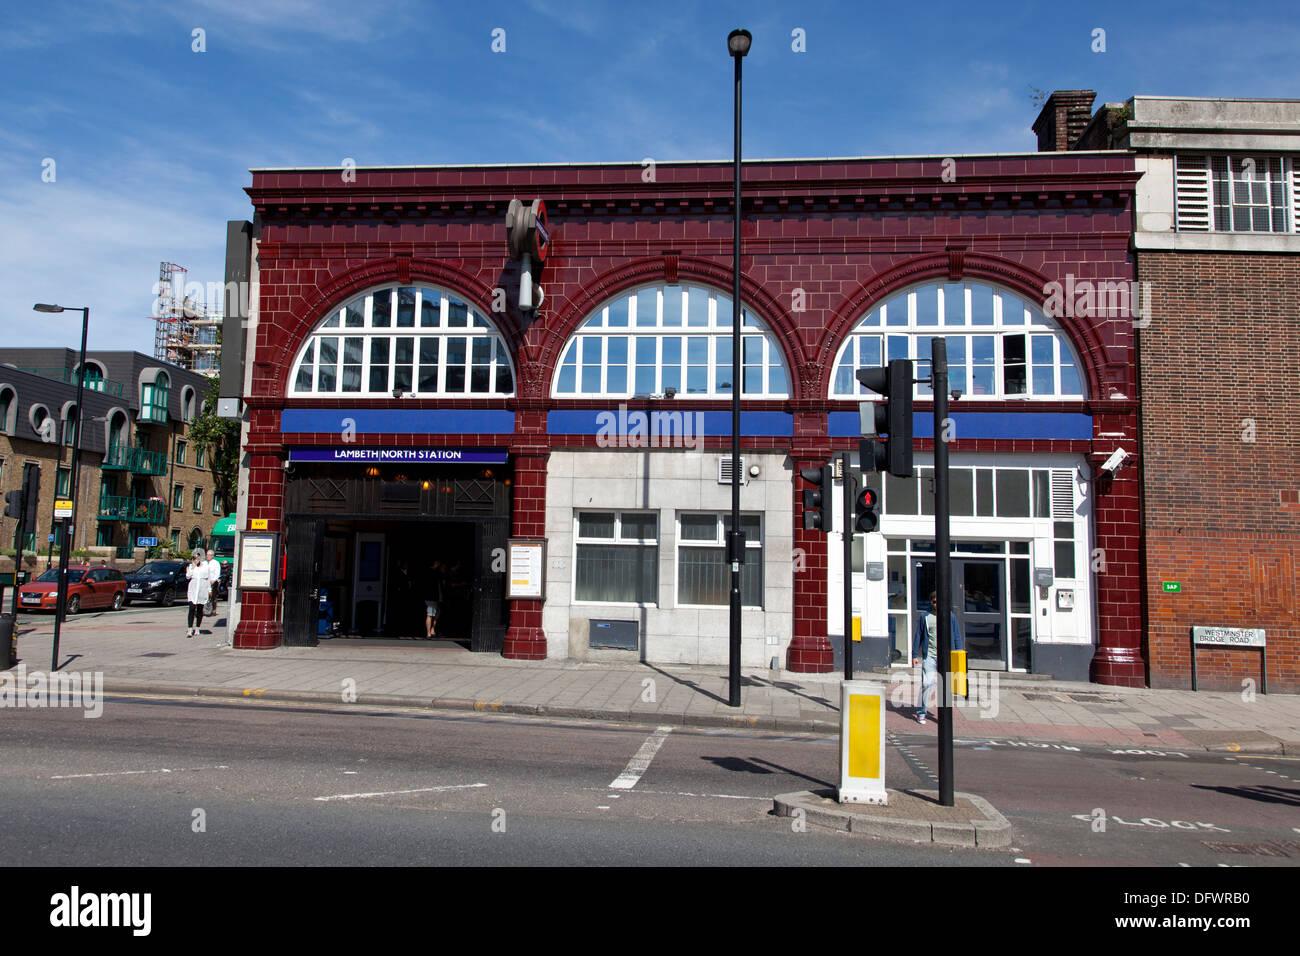 Lambeth North underground station designed by Leslie Green, London, UK - Stock Image